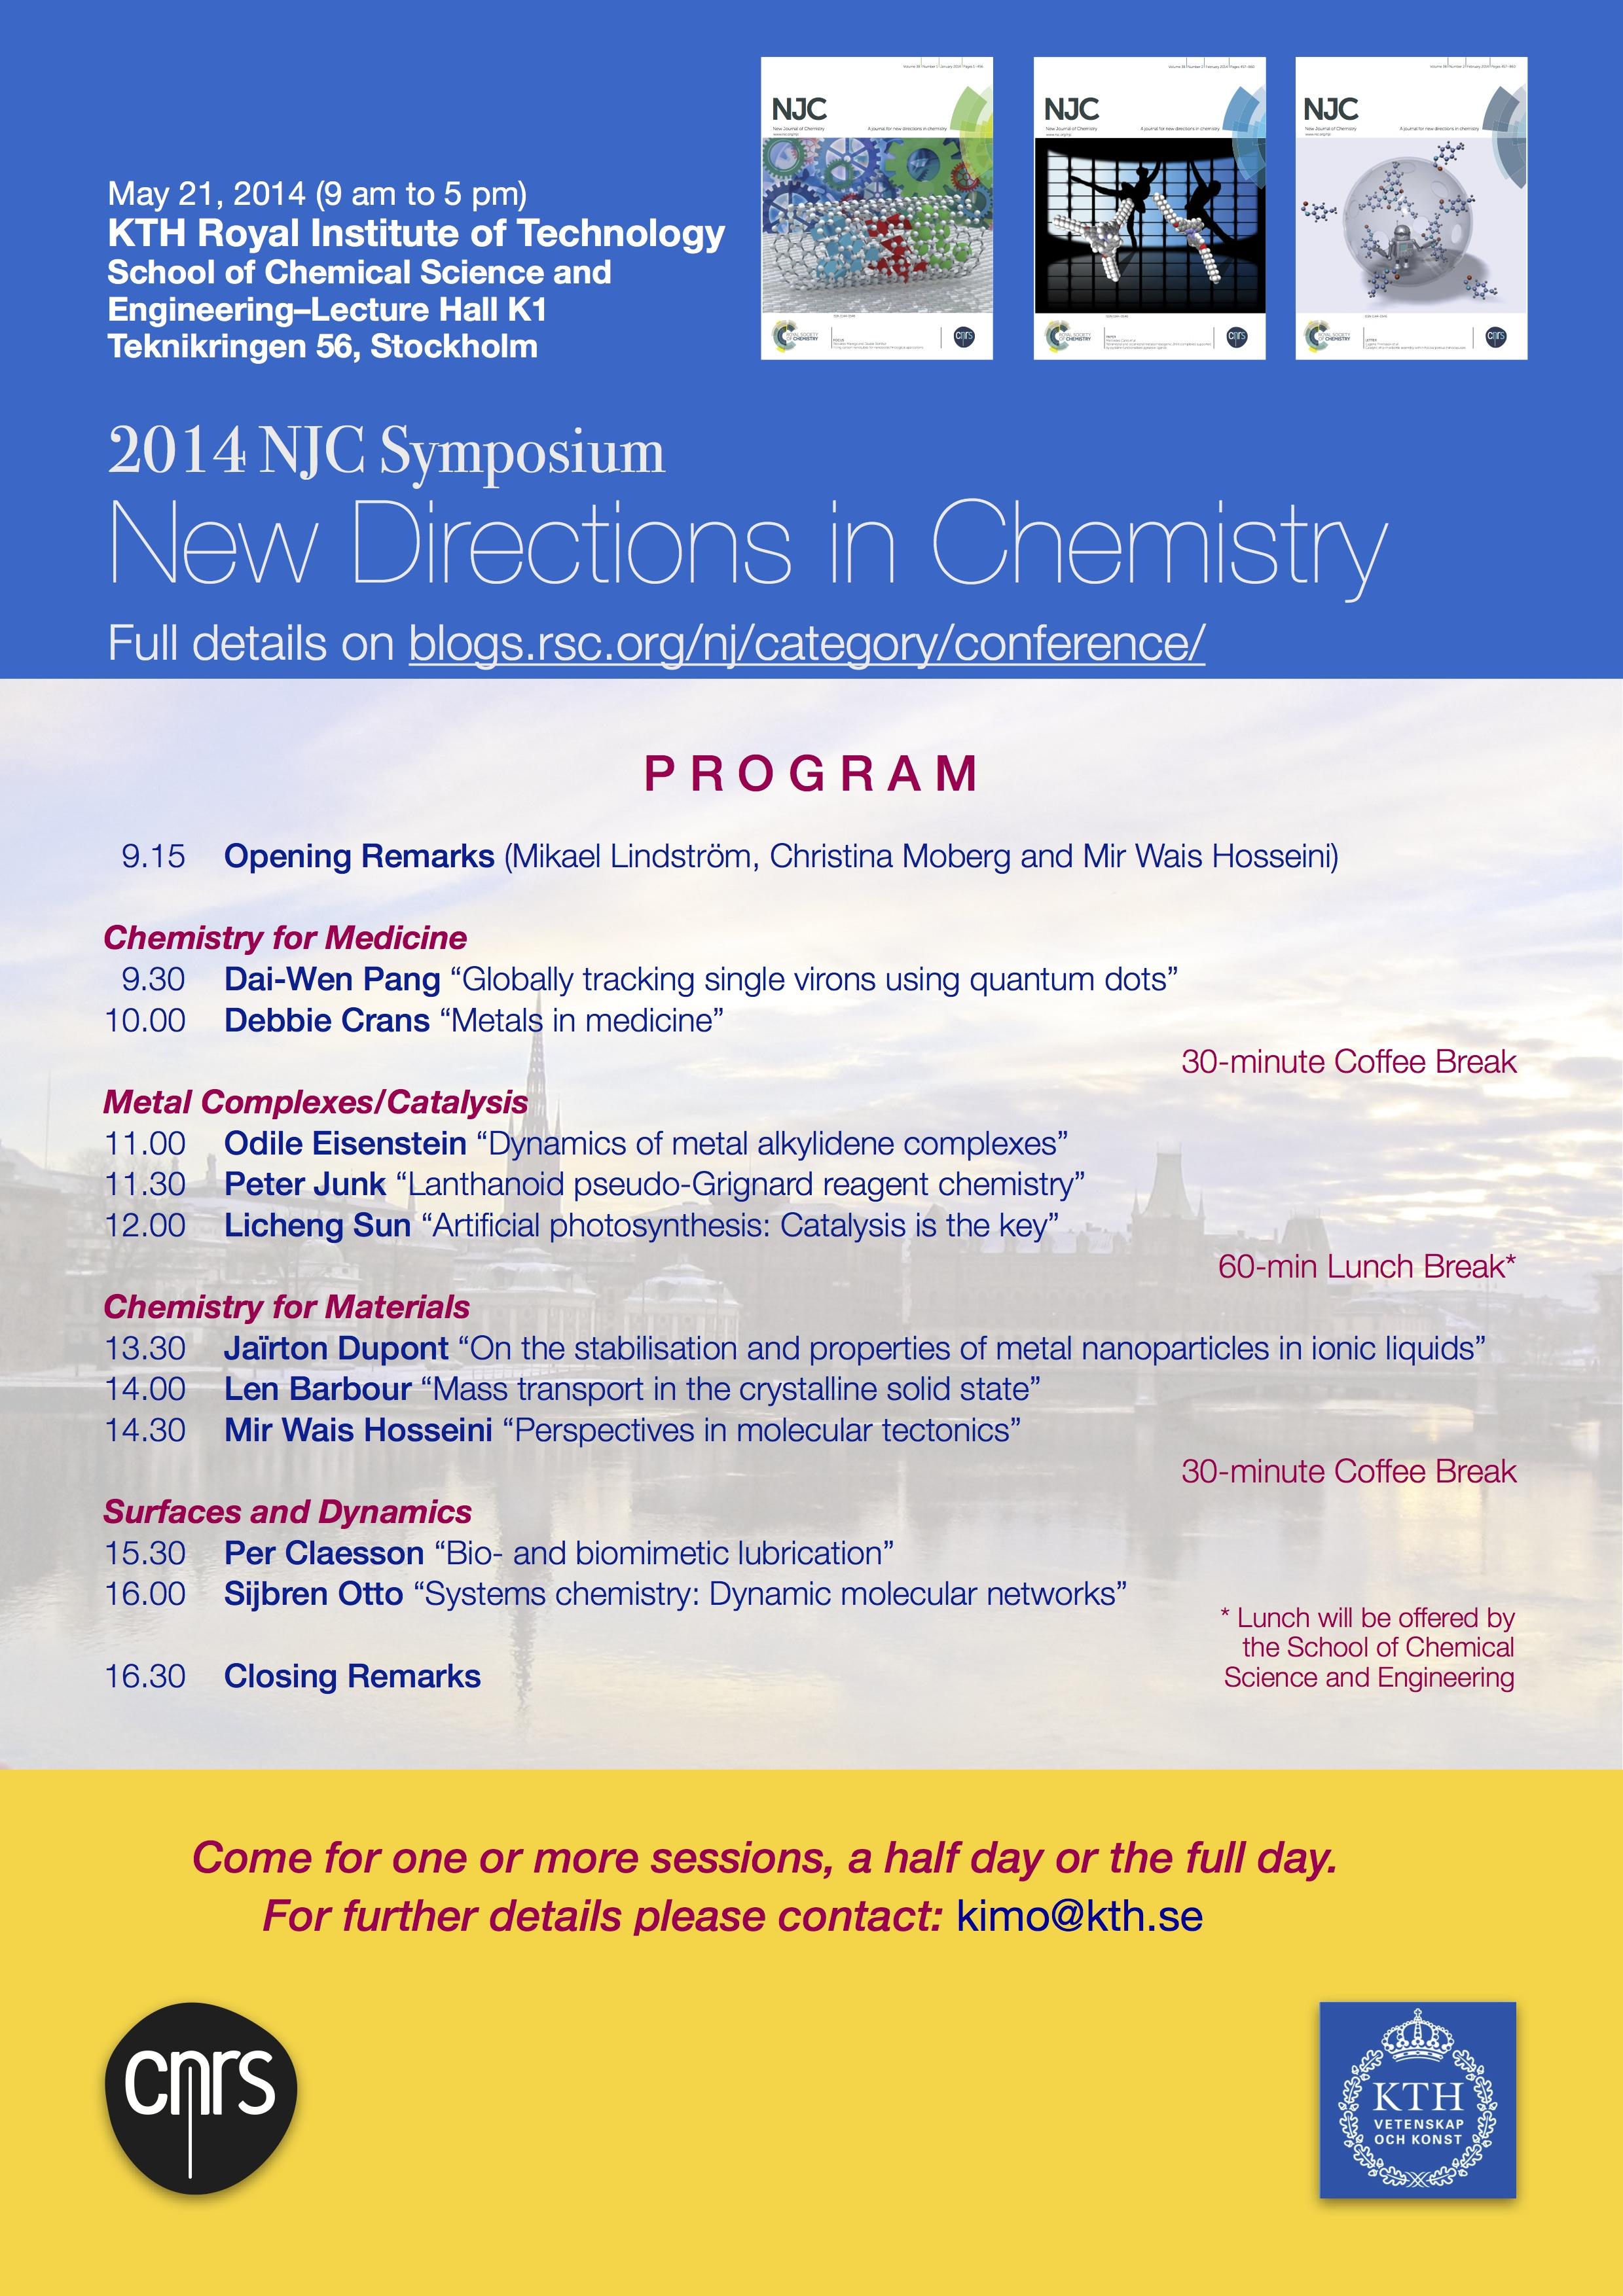 NJC Symposium at KTH on May 21, 2014